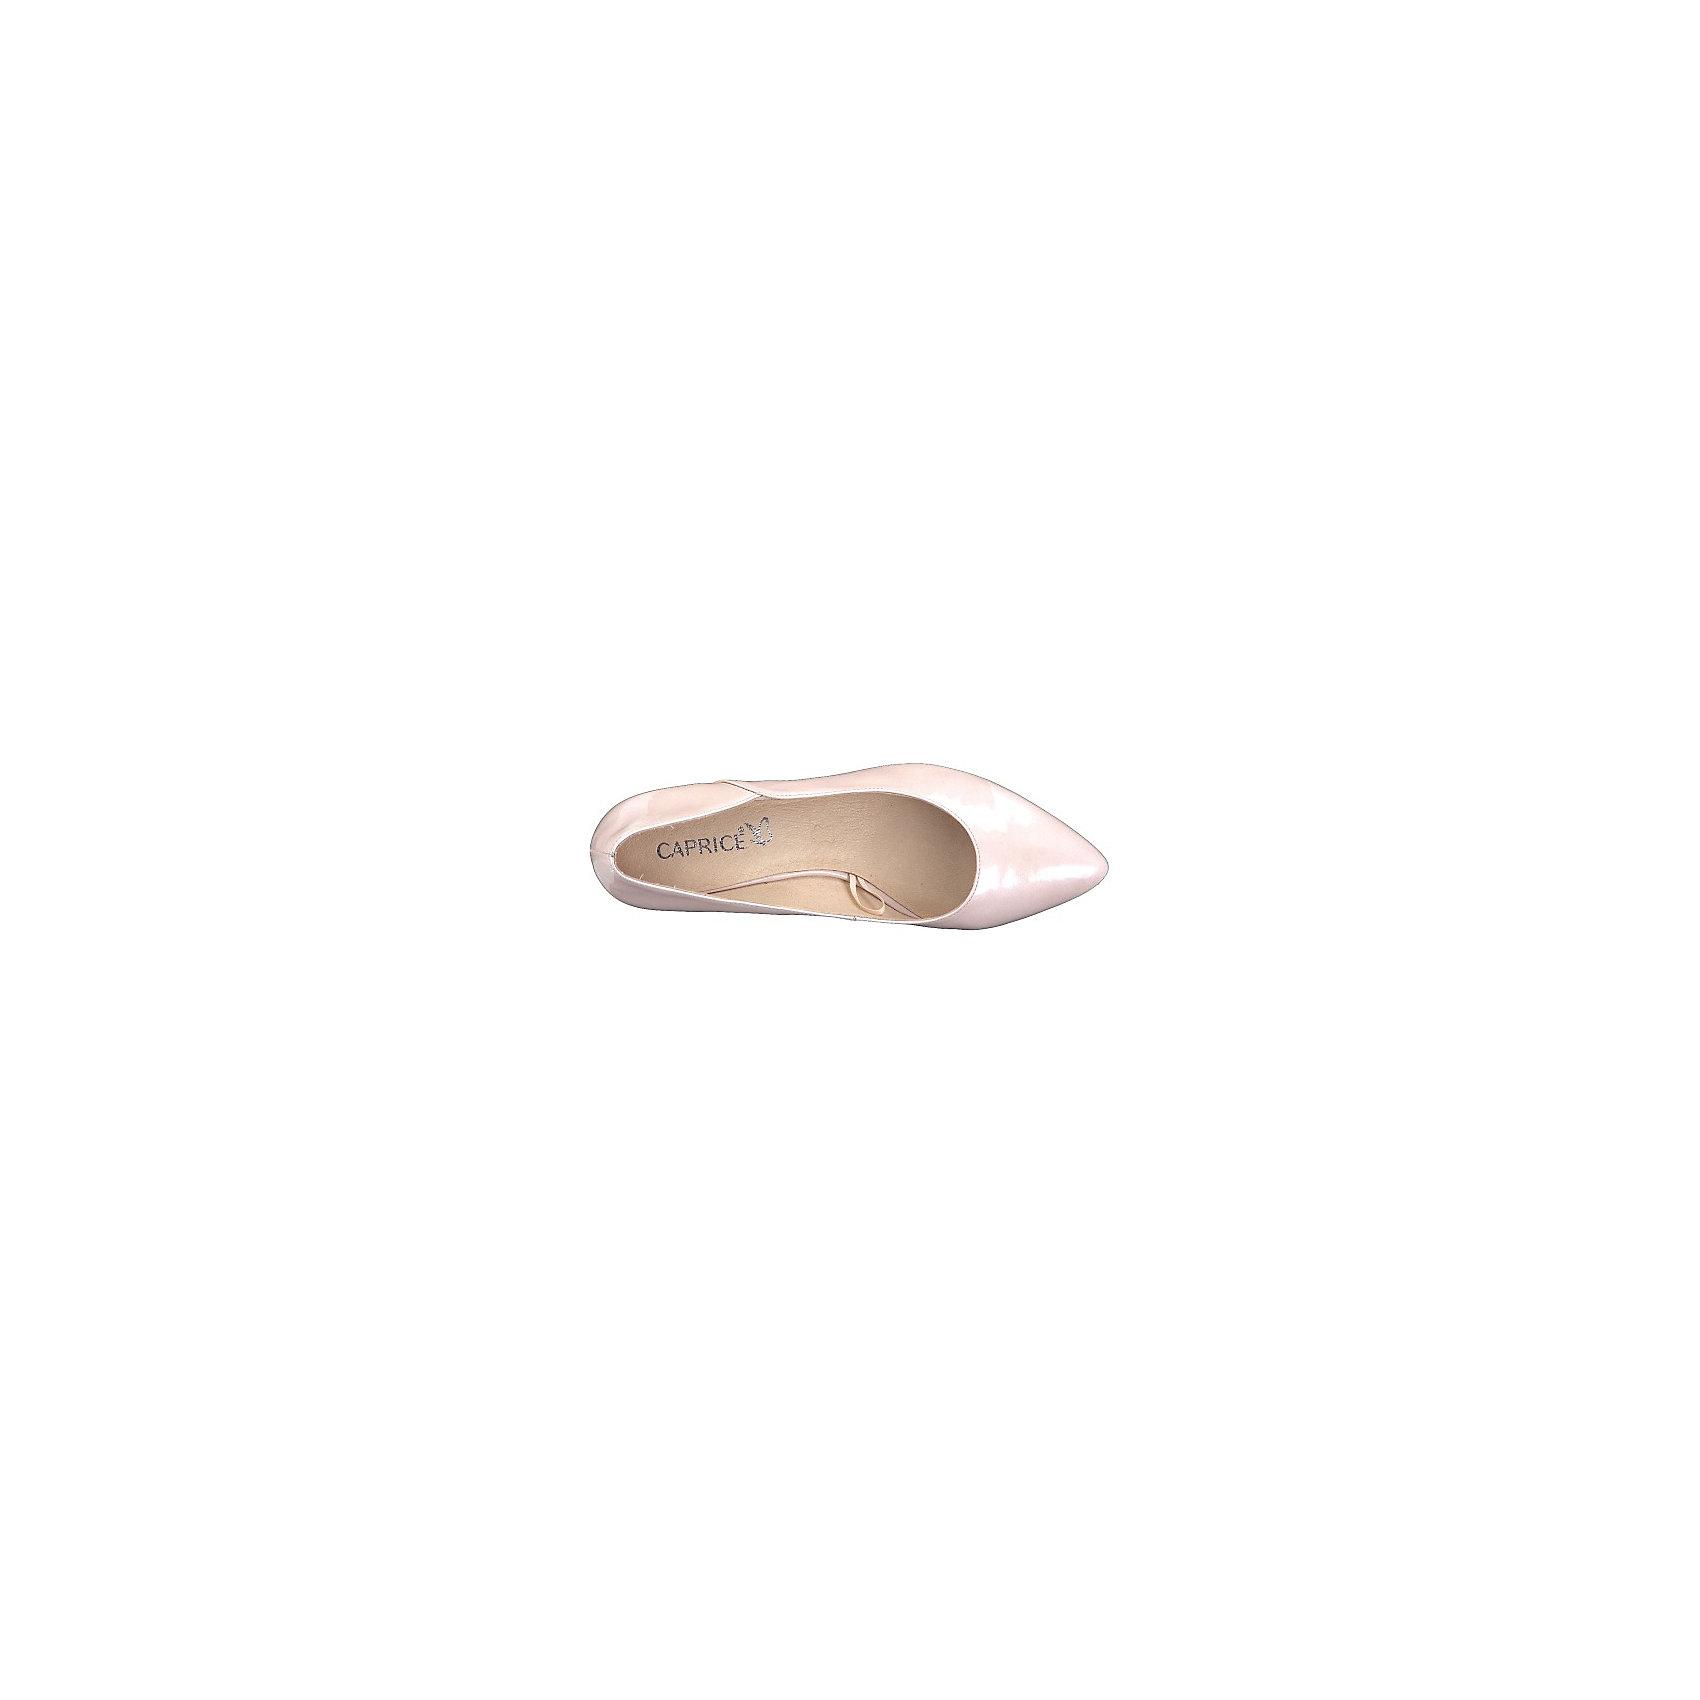 Details zu Neu CAPRICE Cristina Pumps 7073601 für Damen schwarz rosa